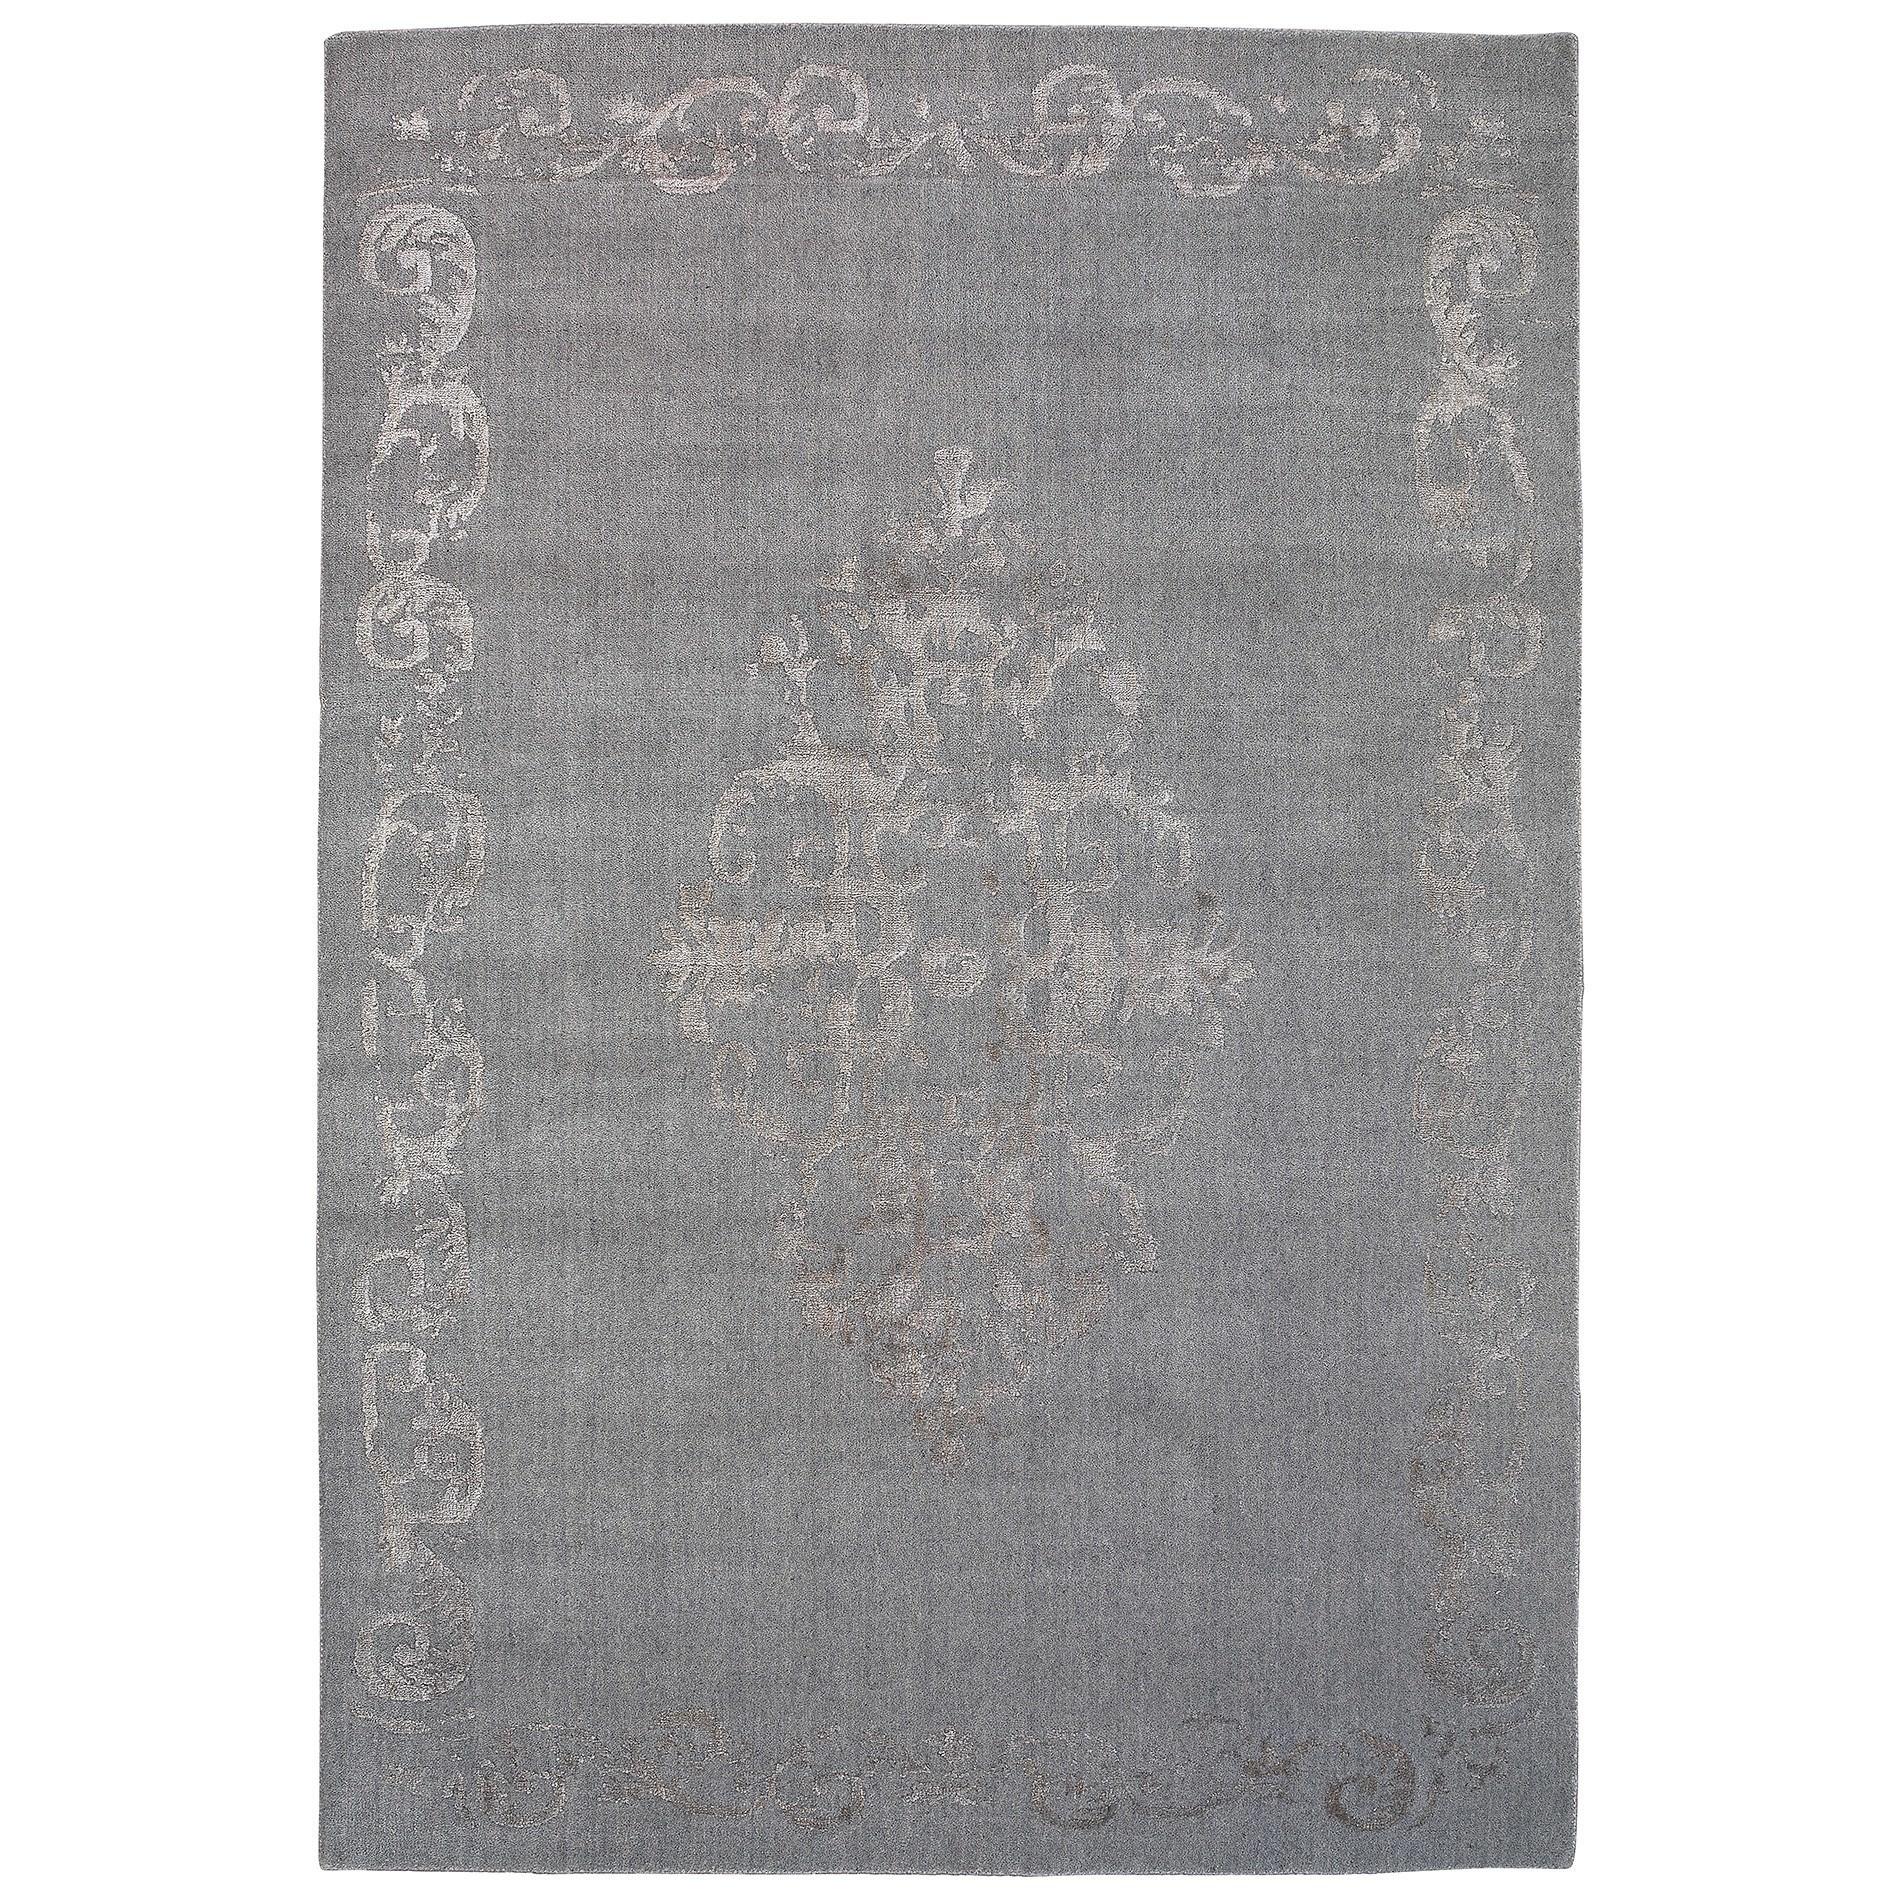 Vienna No.048 Handmade Wool Transitional Rug, 225x155cm, Grey